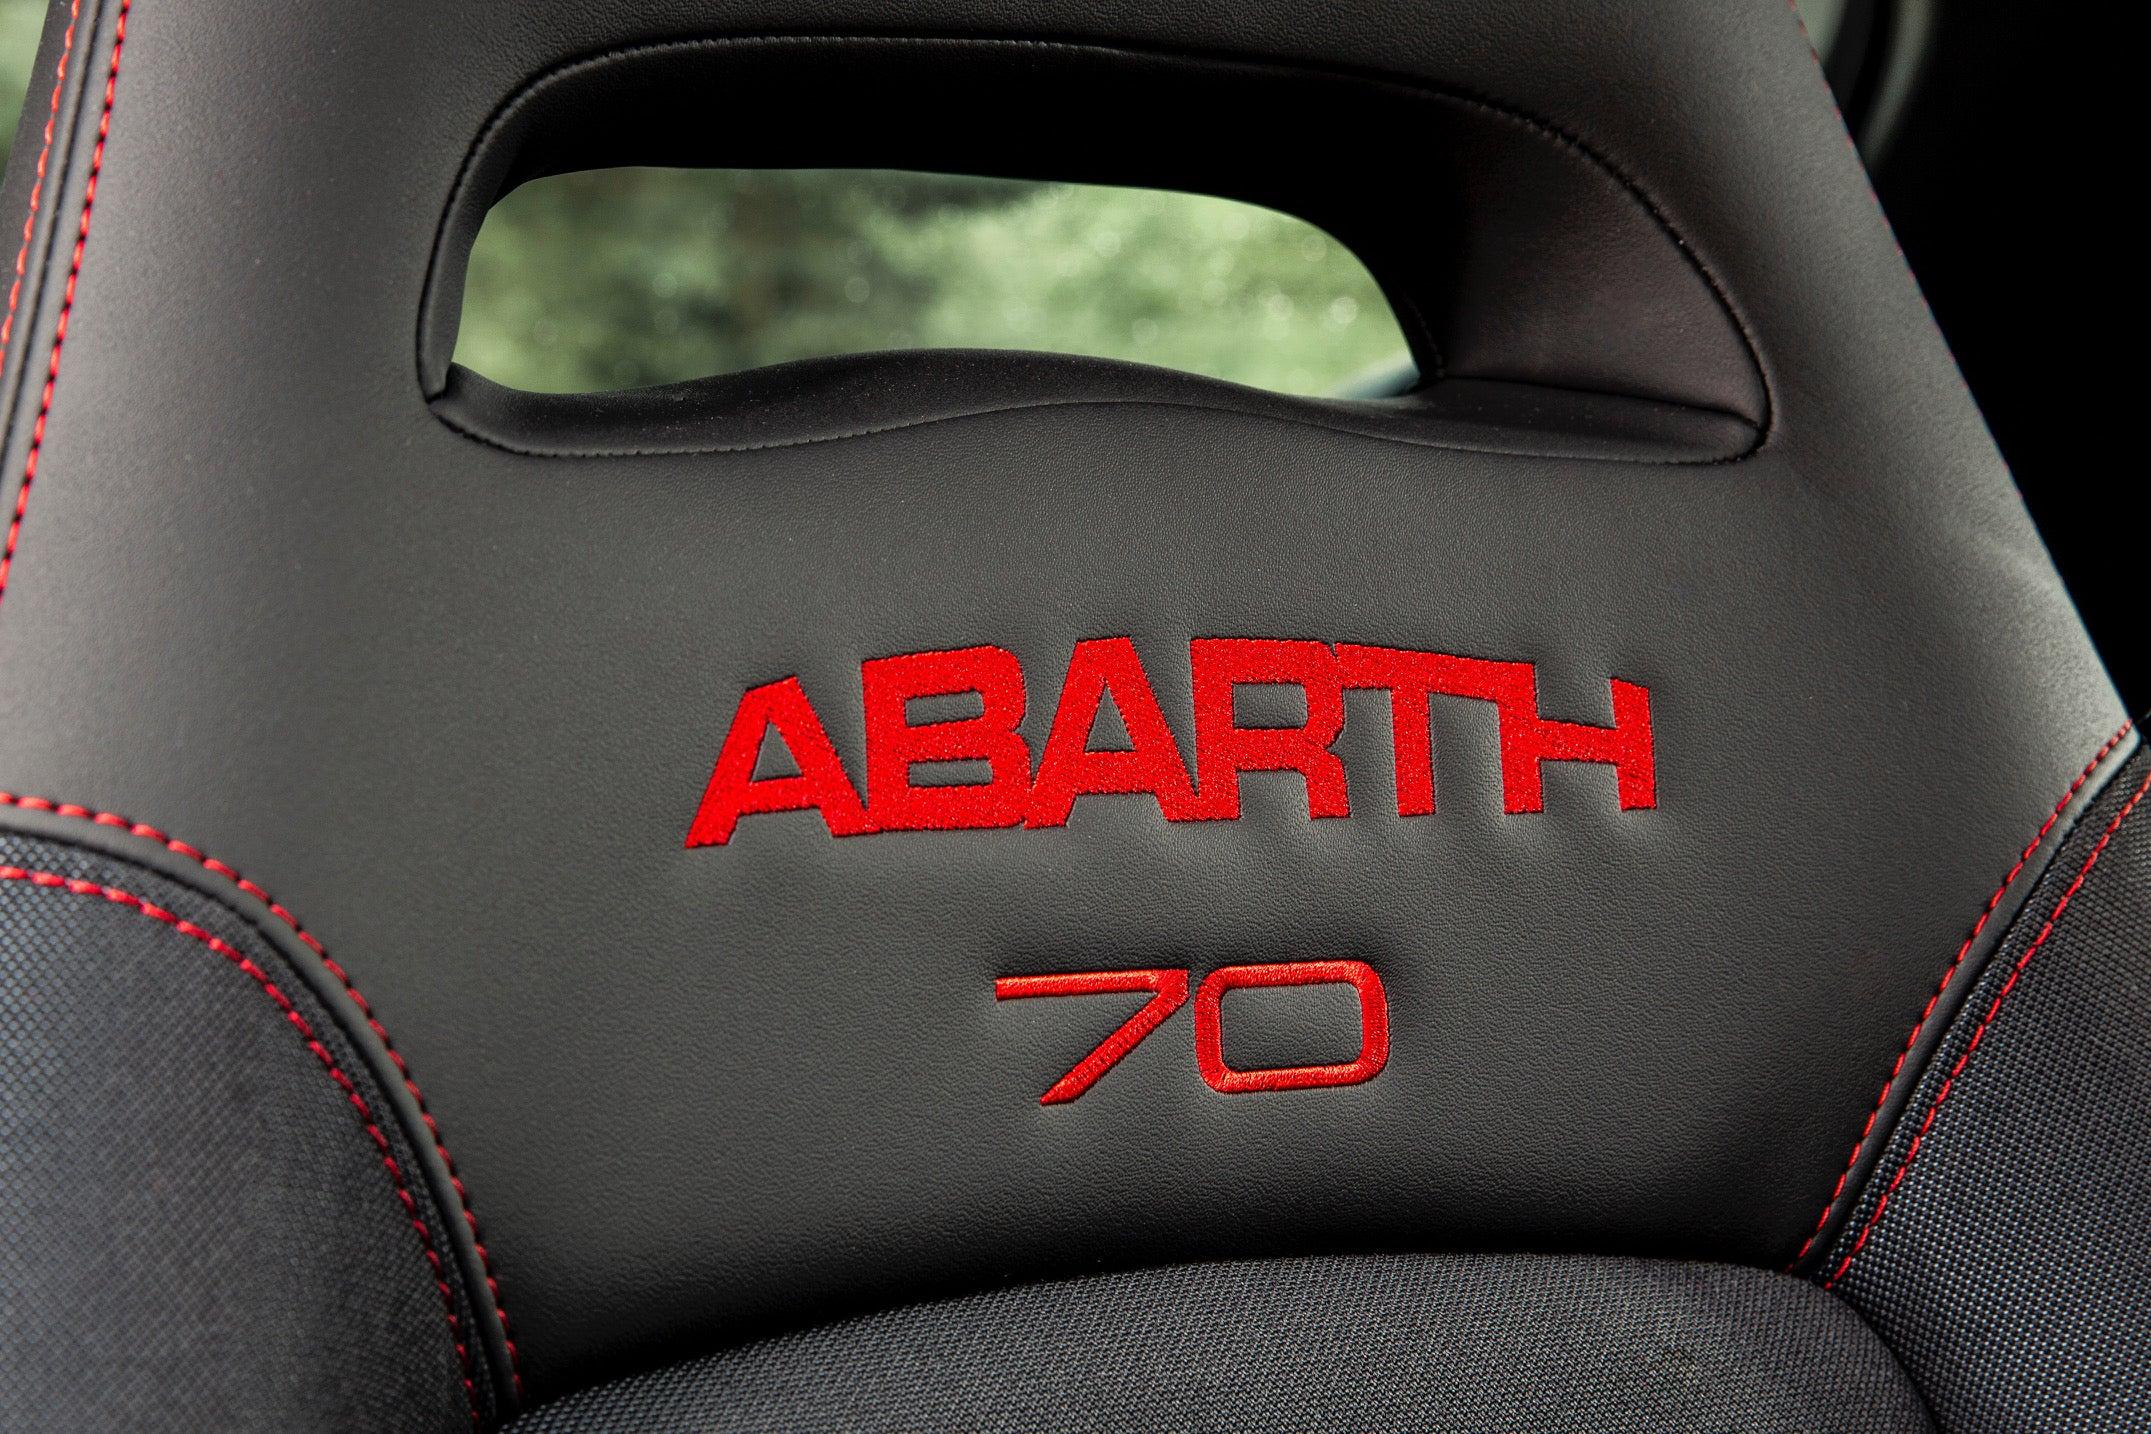 Abarth 595 Seat